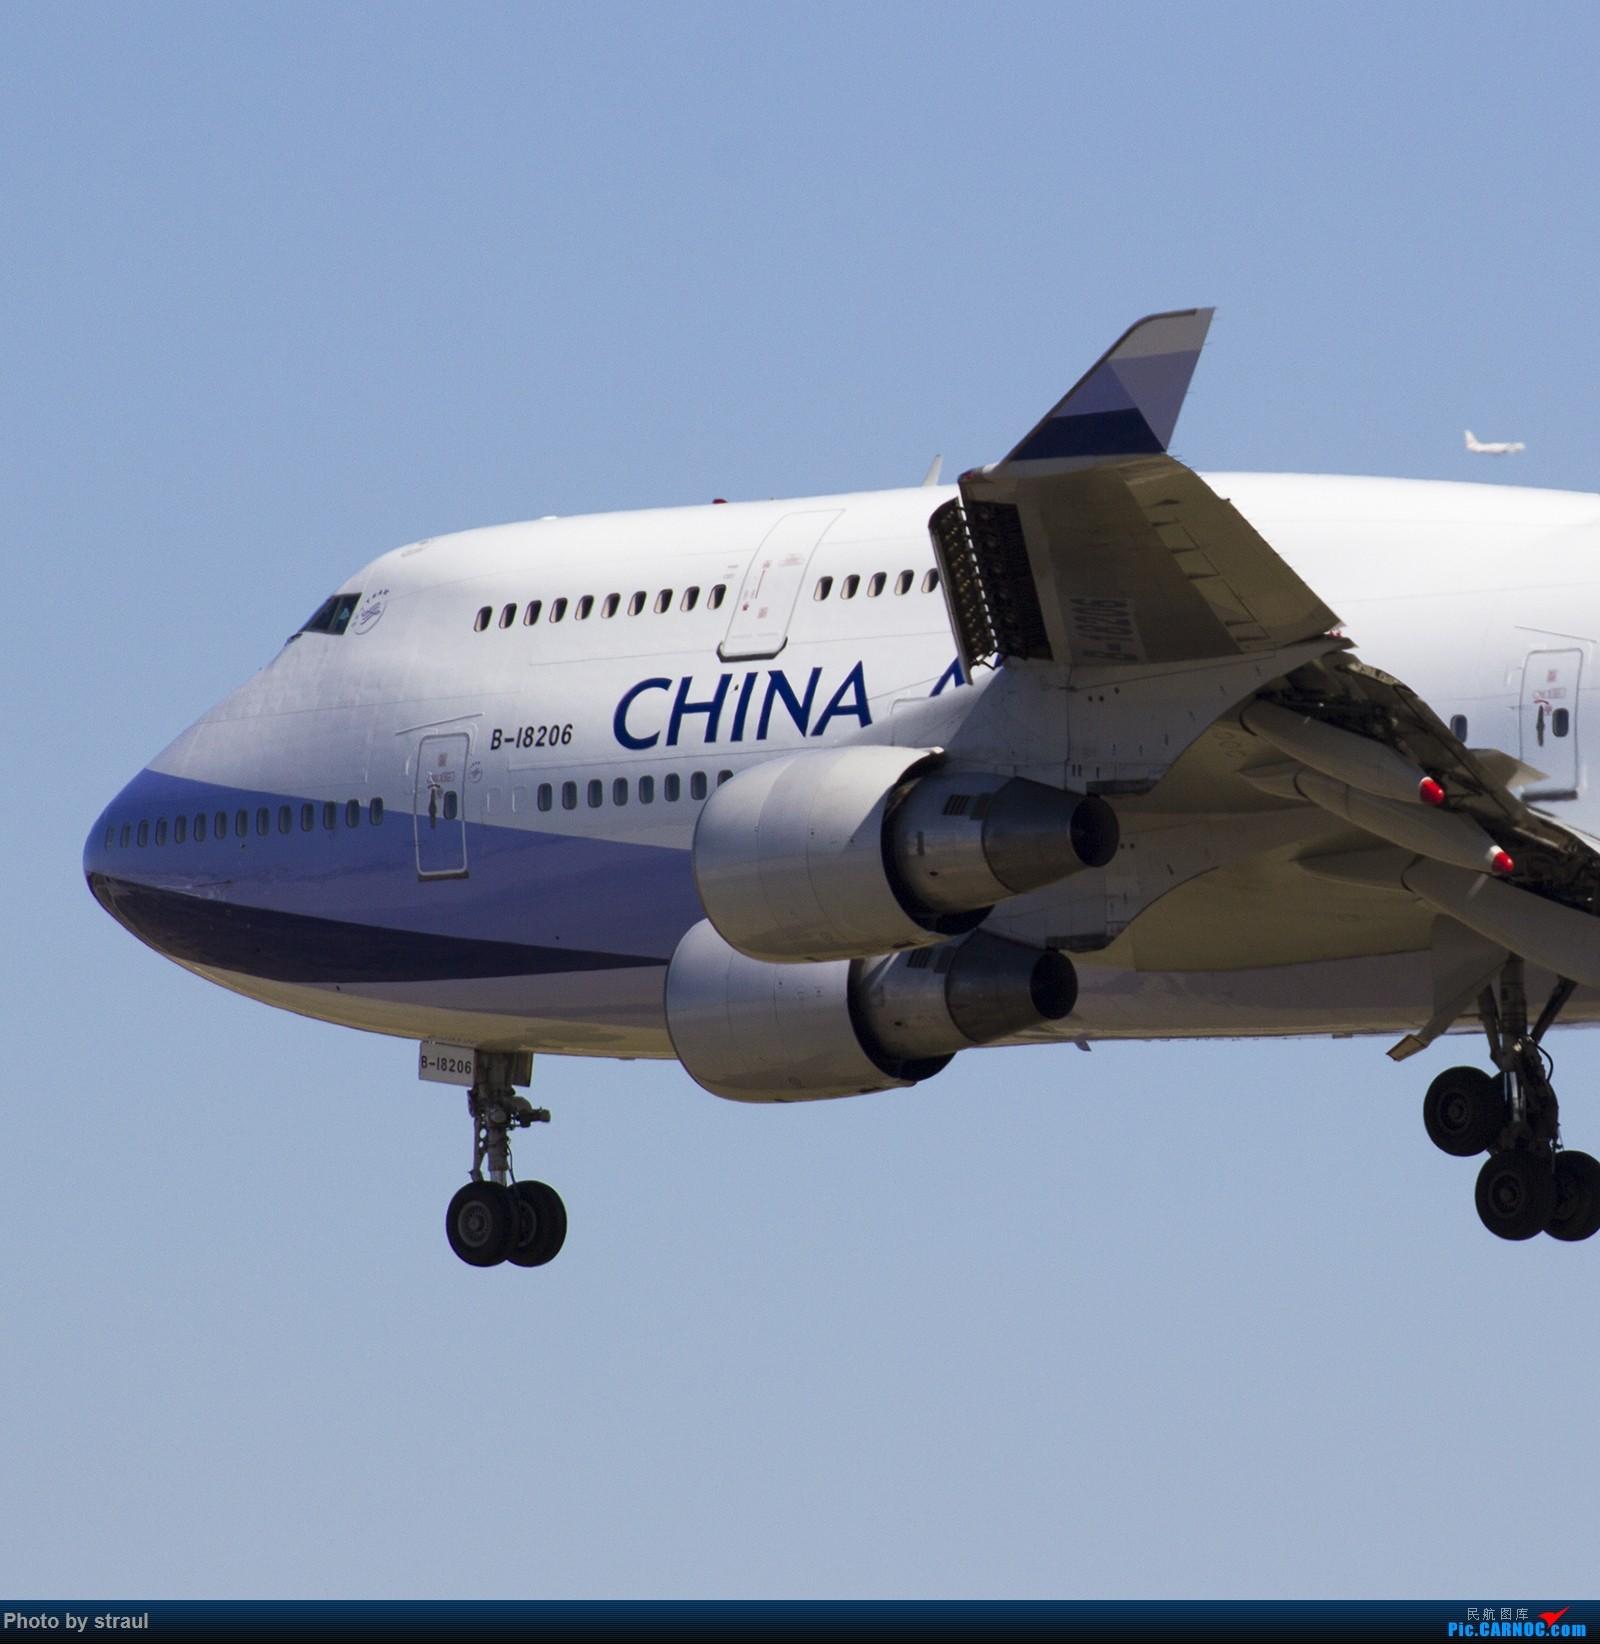 Re:Re:Re:Re:[原创]「好几张图」长荣喵机之星空(B-16722)今日来到了北京 BOEING 747-400 B-18206 中国北京首都国际机场